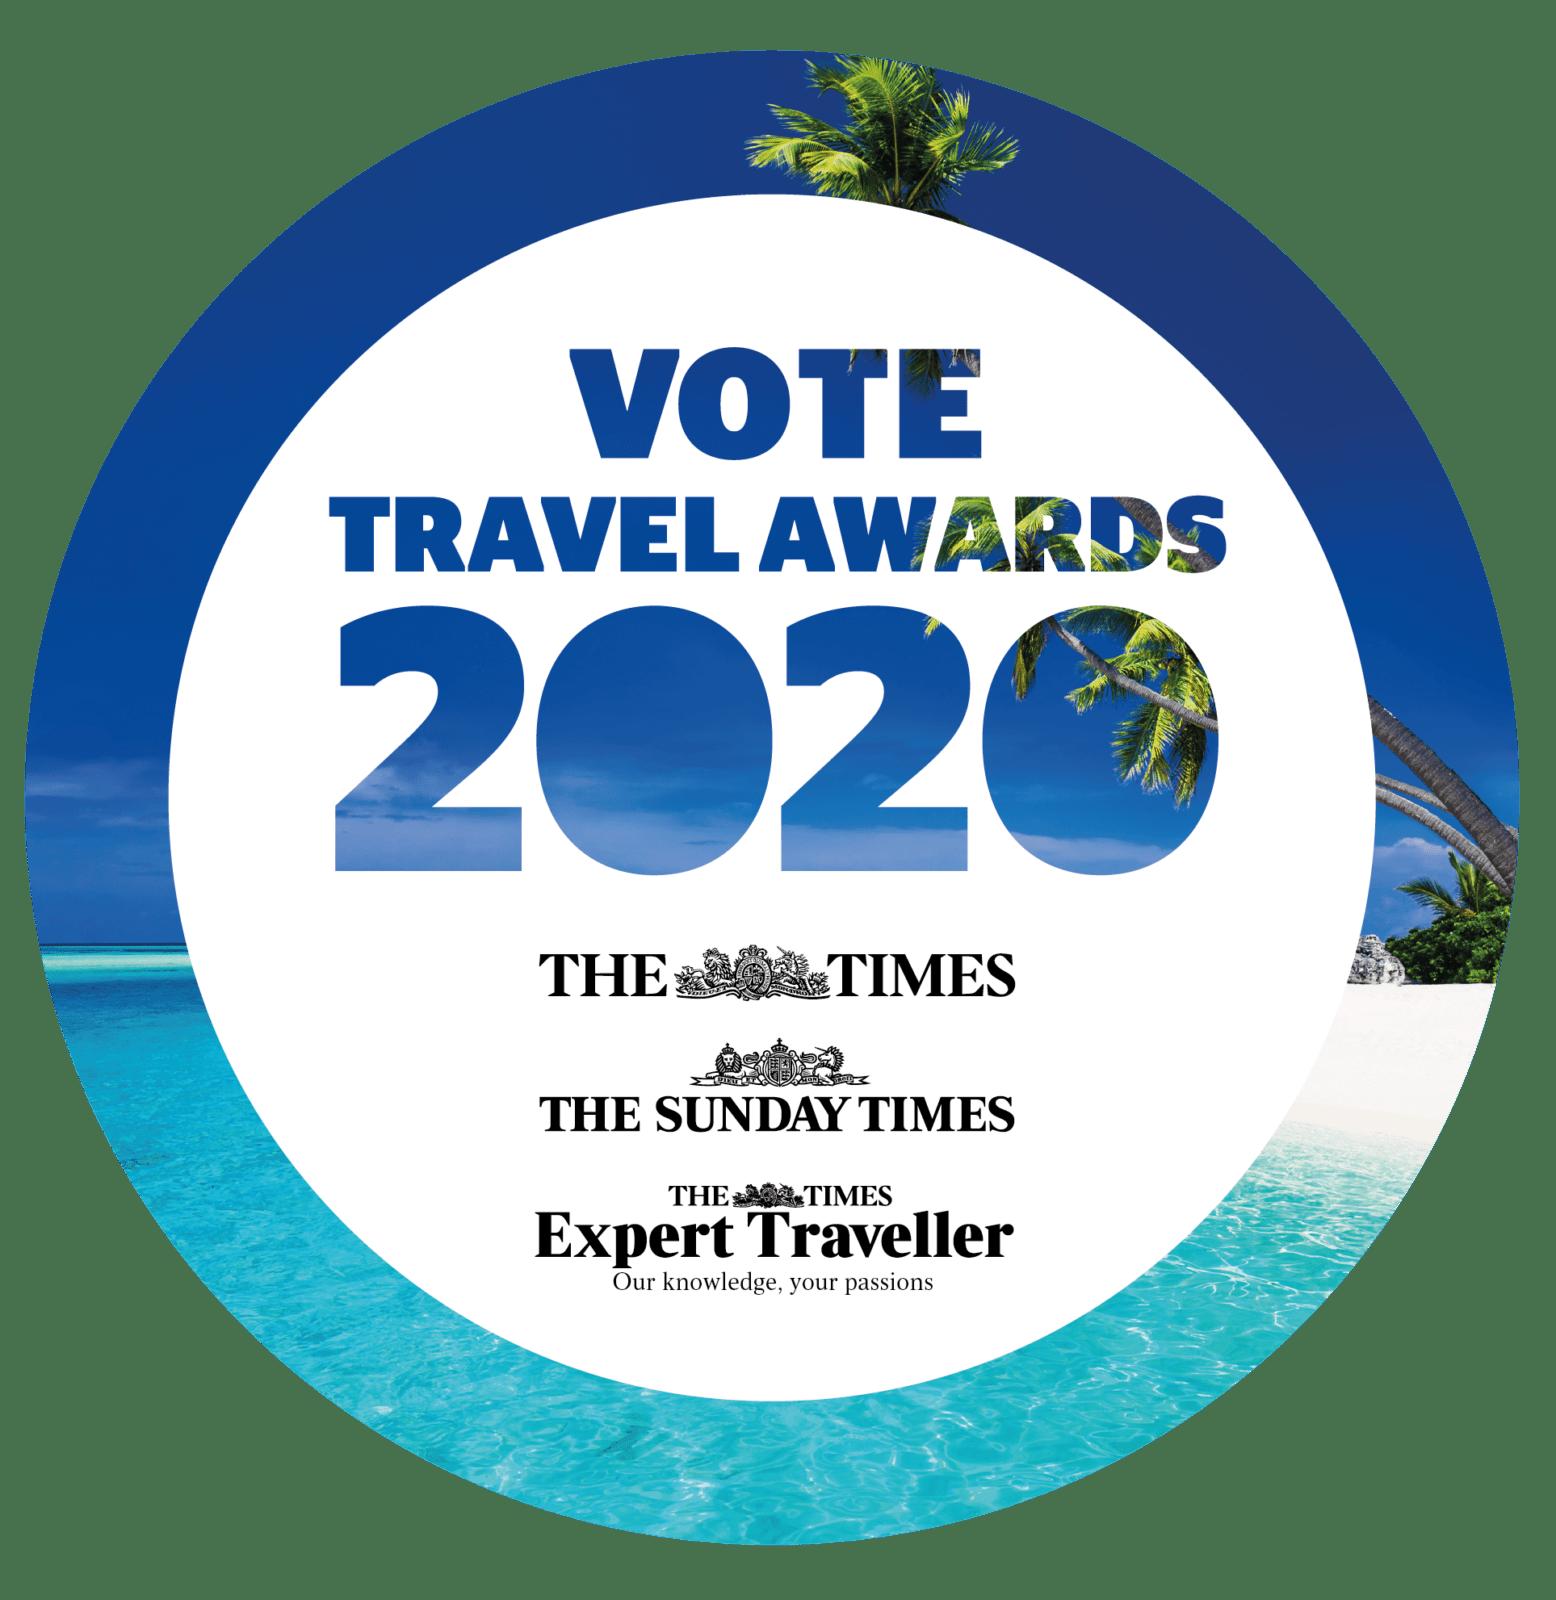 Travel Awards 2020